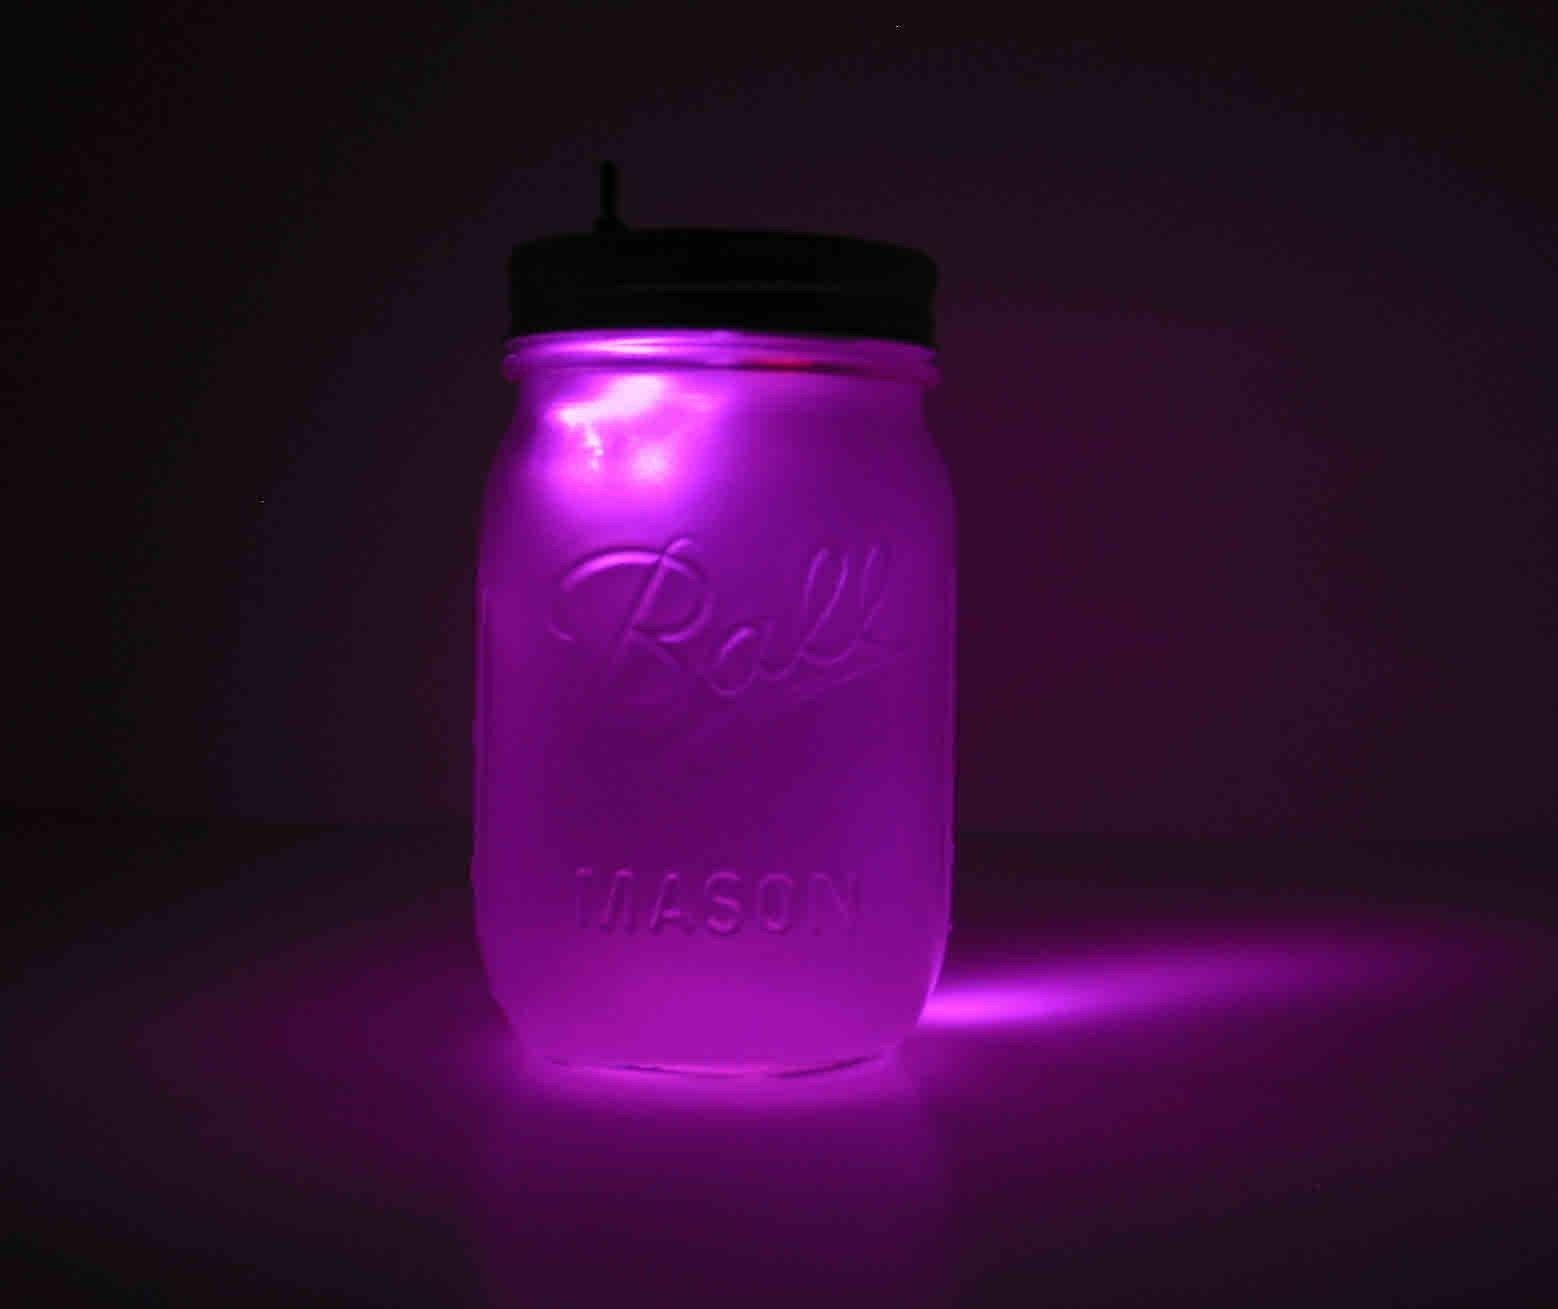 Lavender Mason Jar Night Light By Geekgear On Etsy